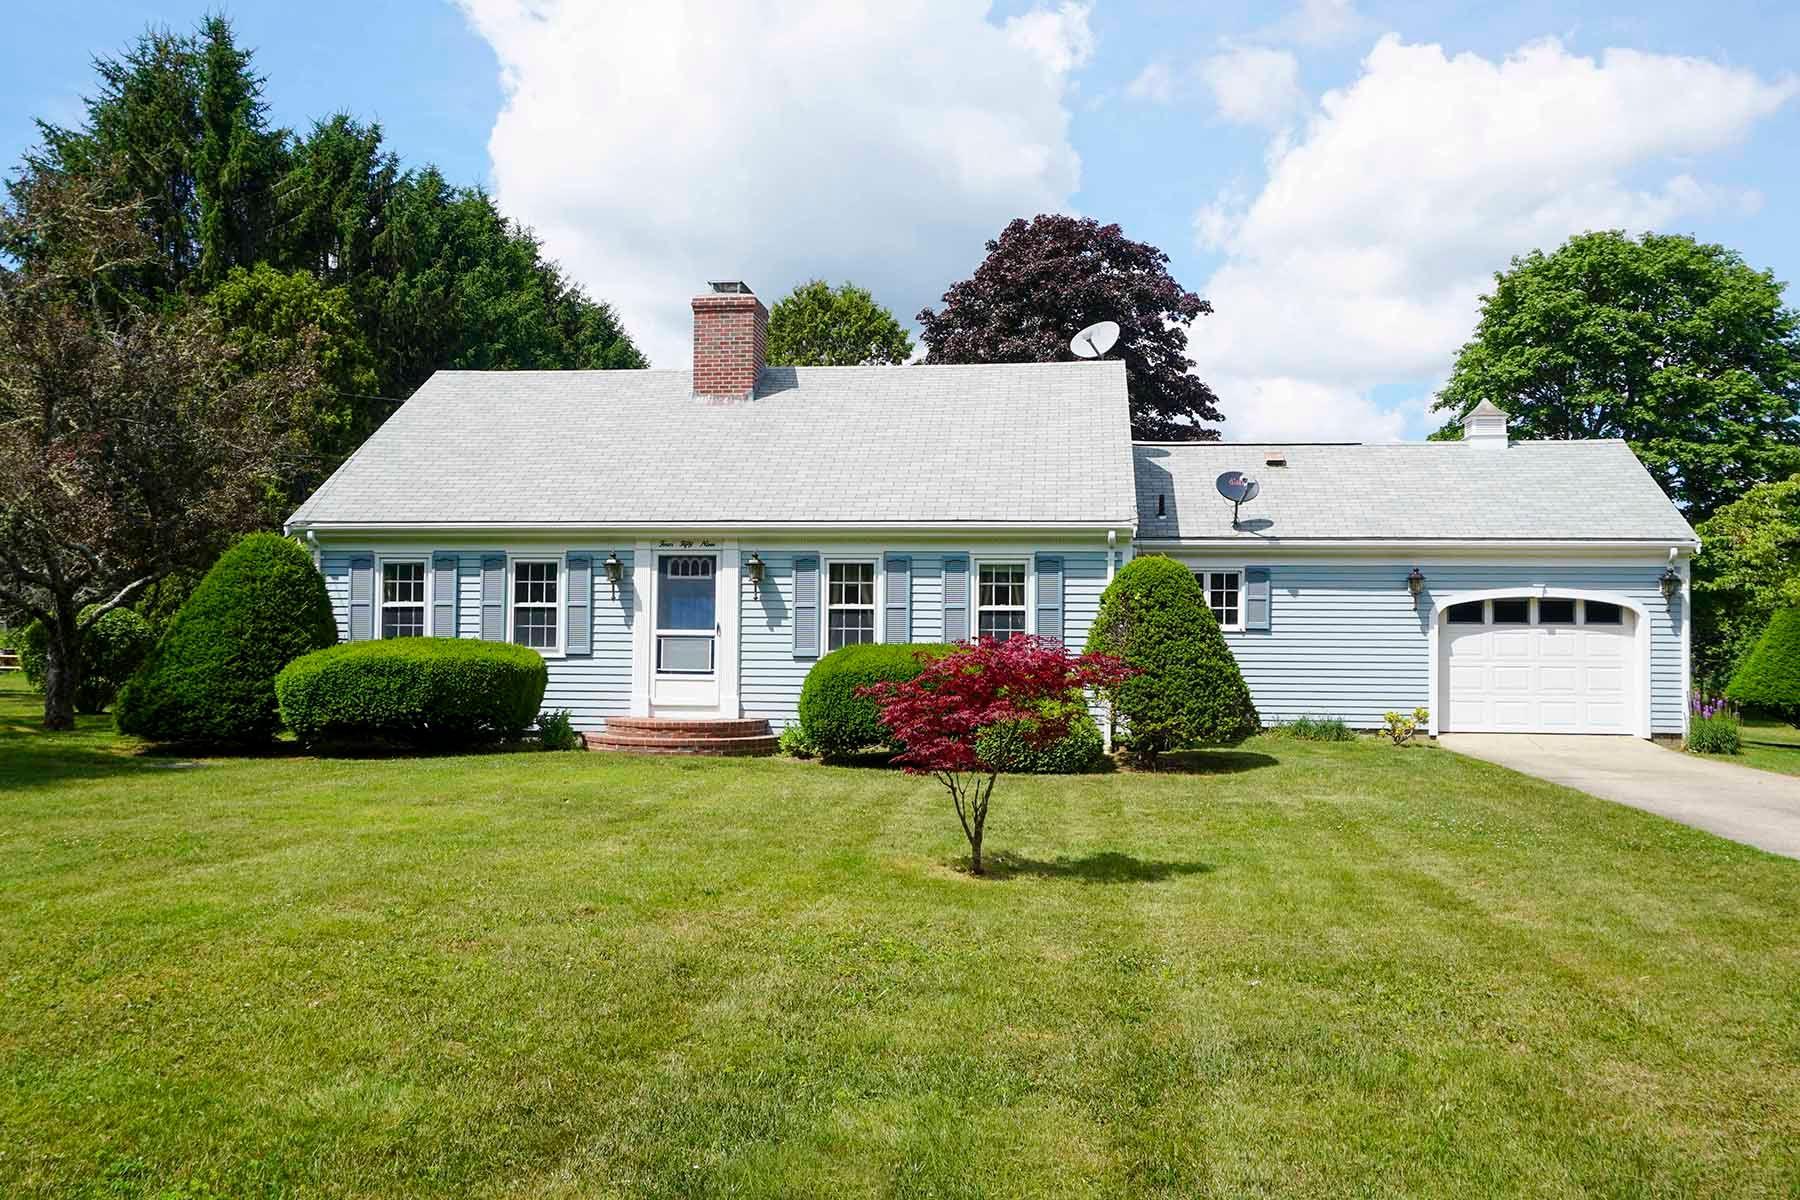 Single Family Homes για την Πώληση στο Hatchville, Μασαχουσετη 02536 Ηνωμένες Πολιτείες